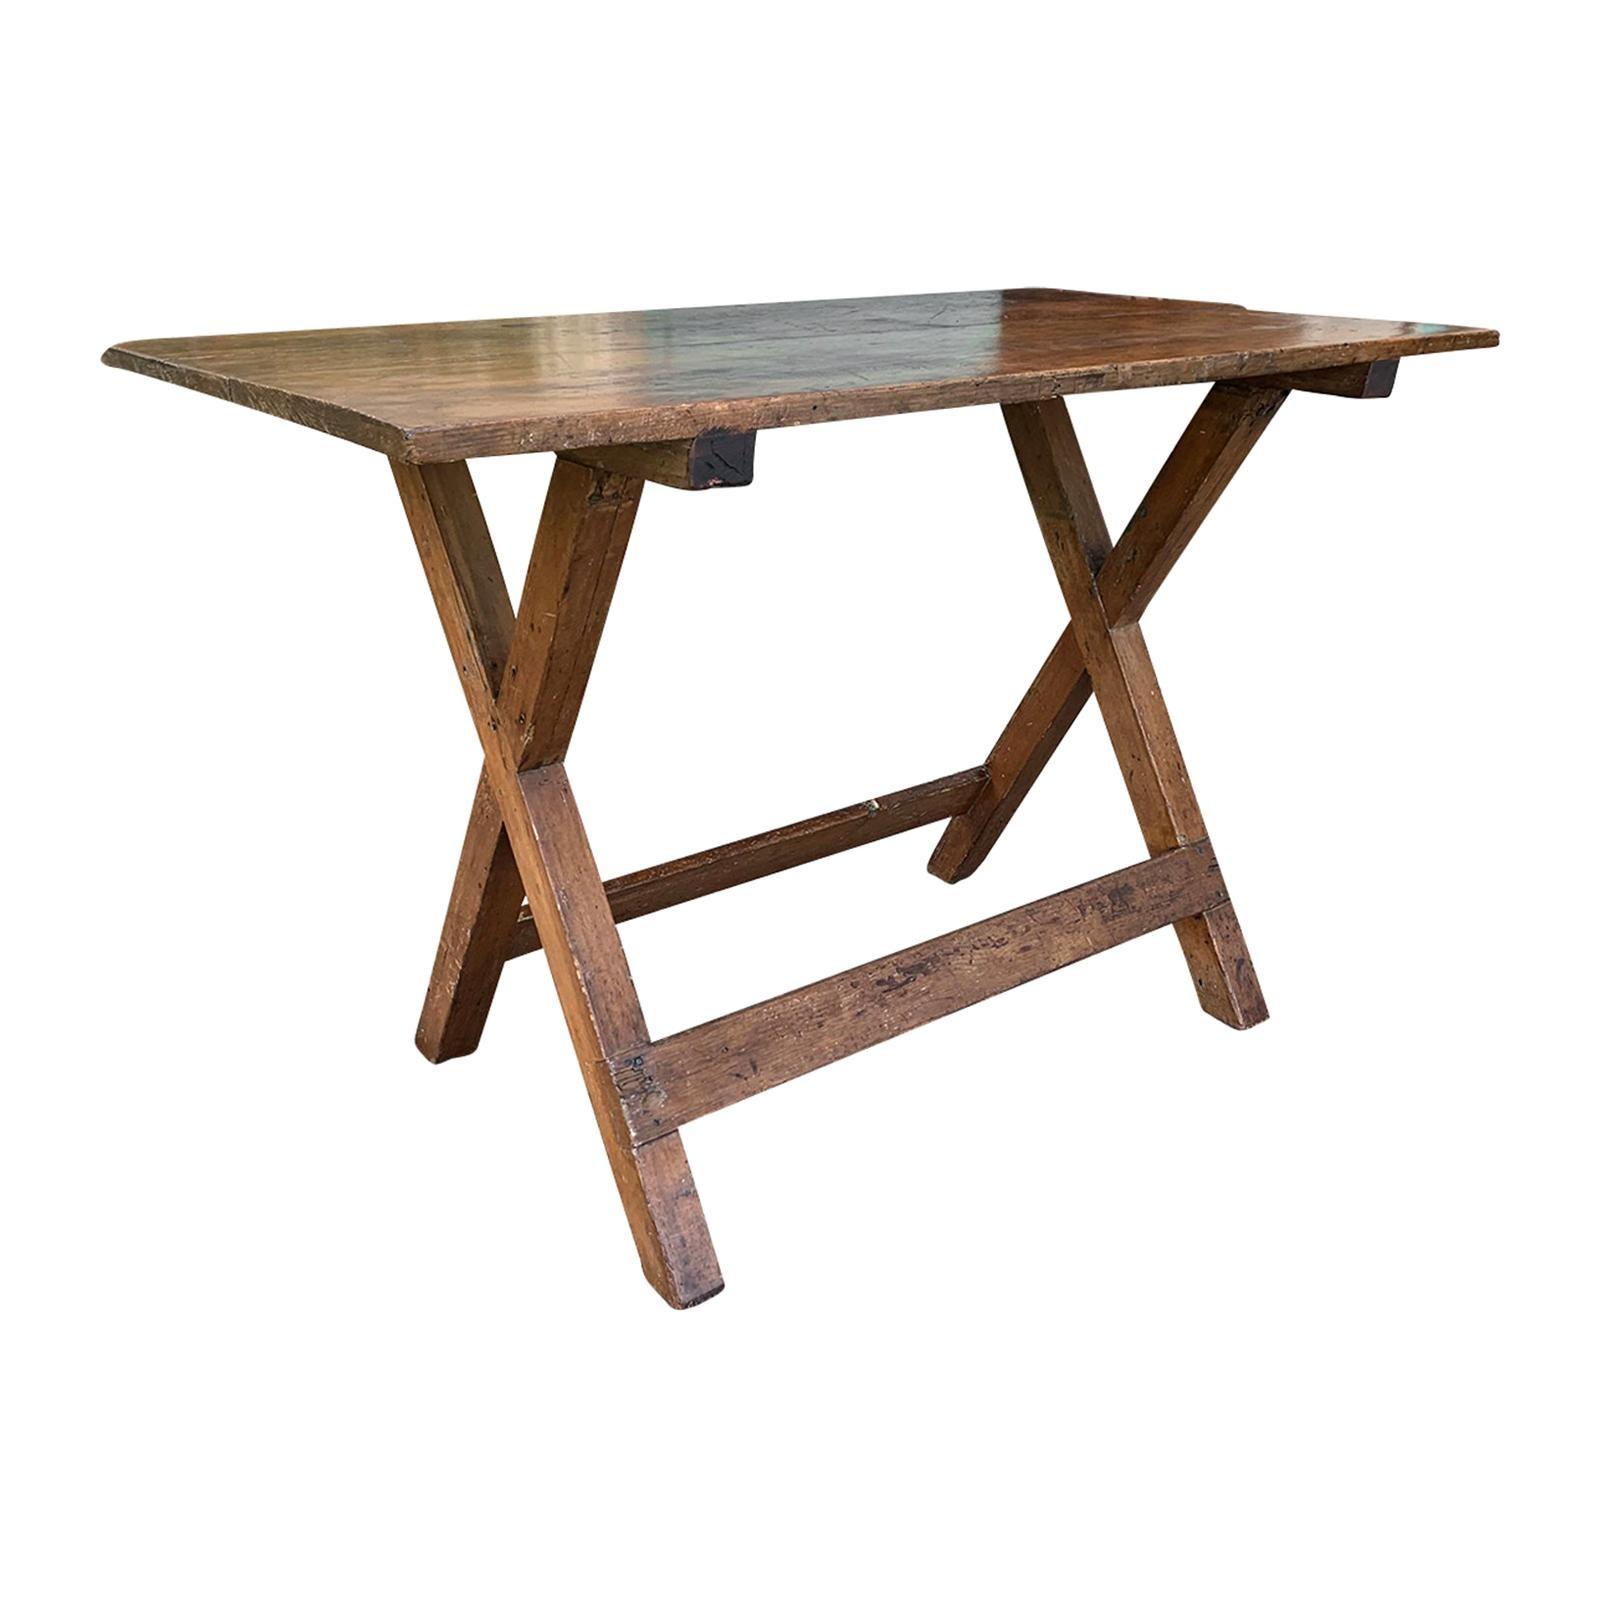 19th Century American Pine Sawbuck X-Table